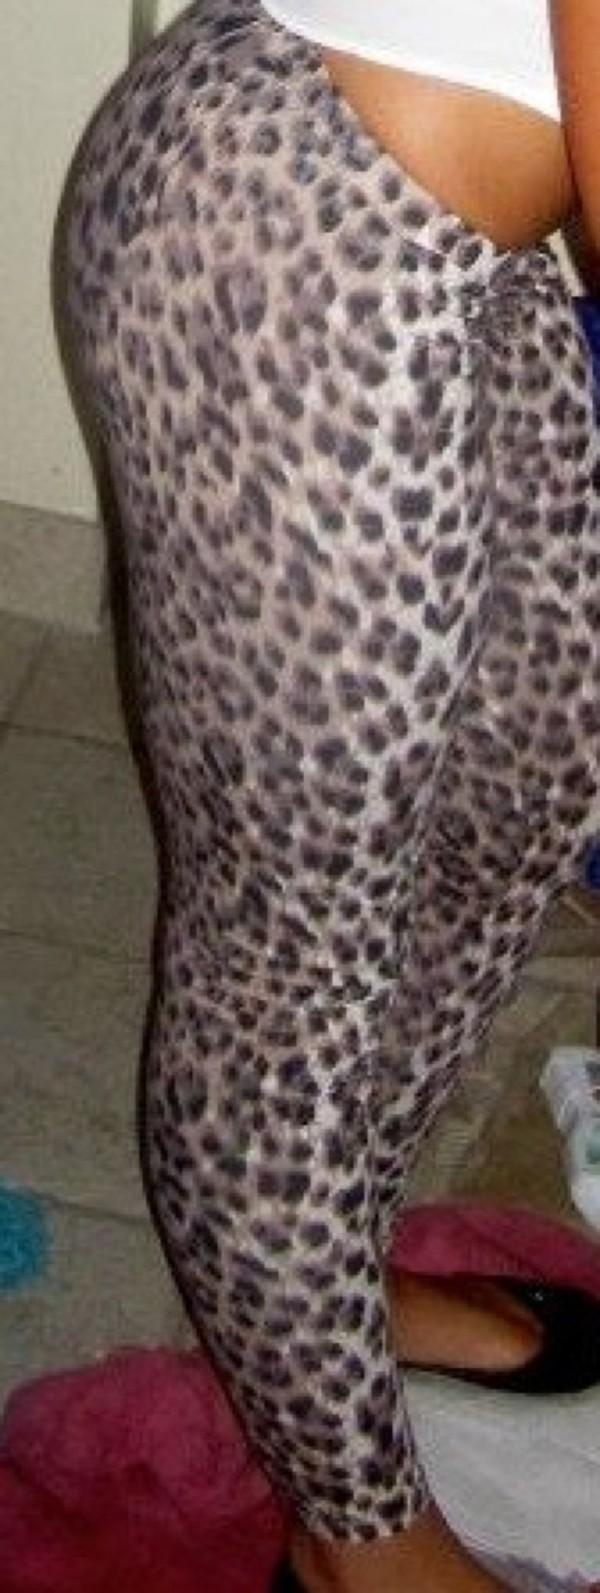 pants tight pants printed pants spandex leopard print